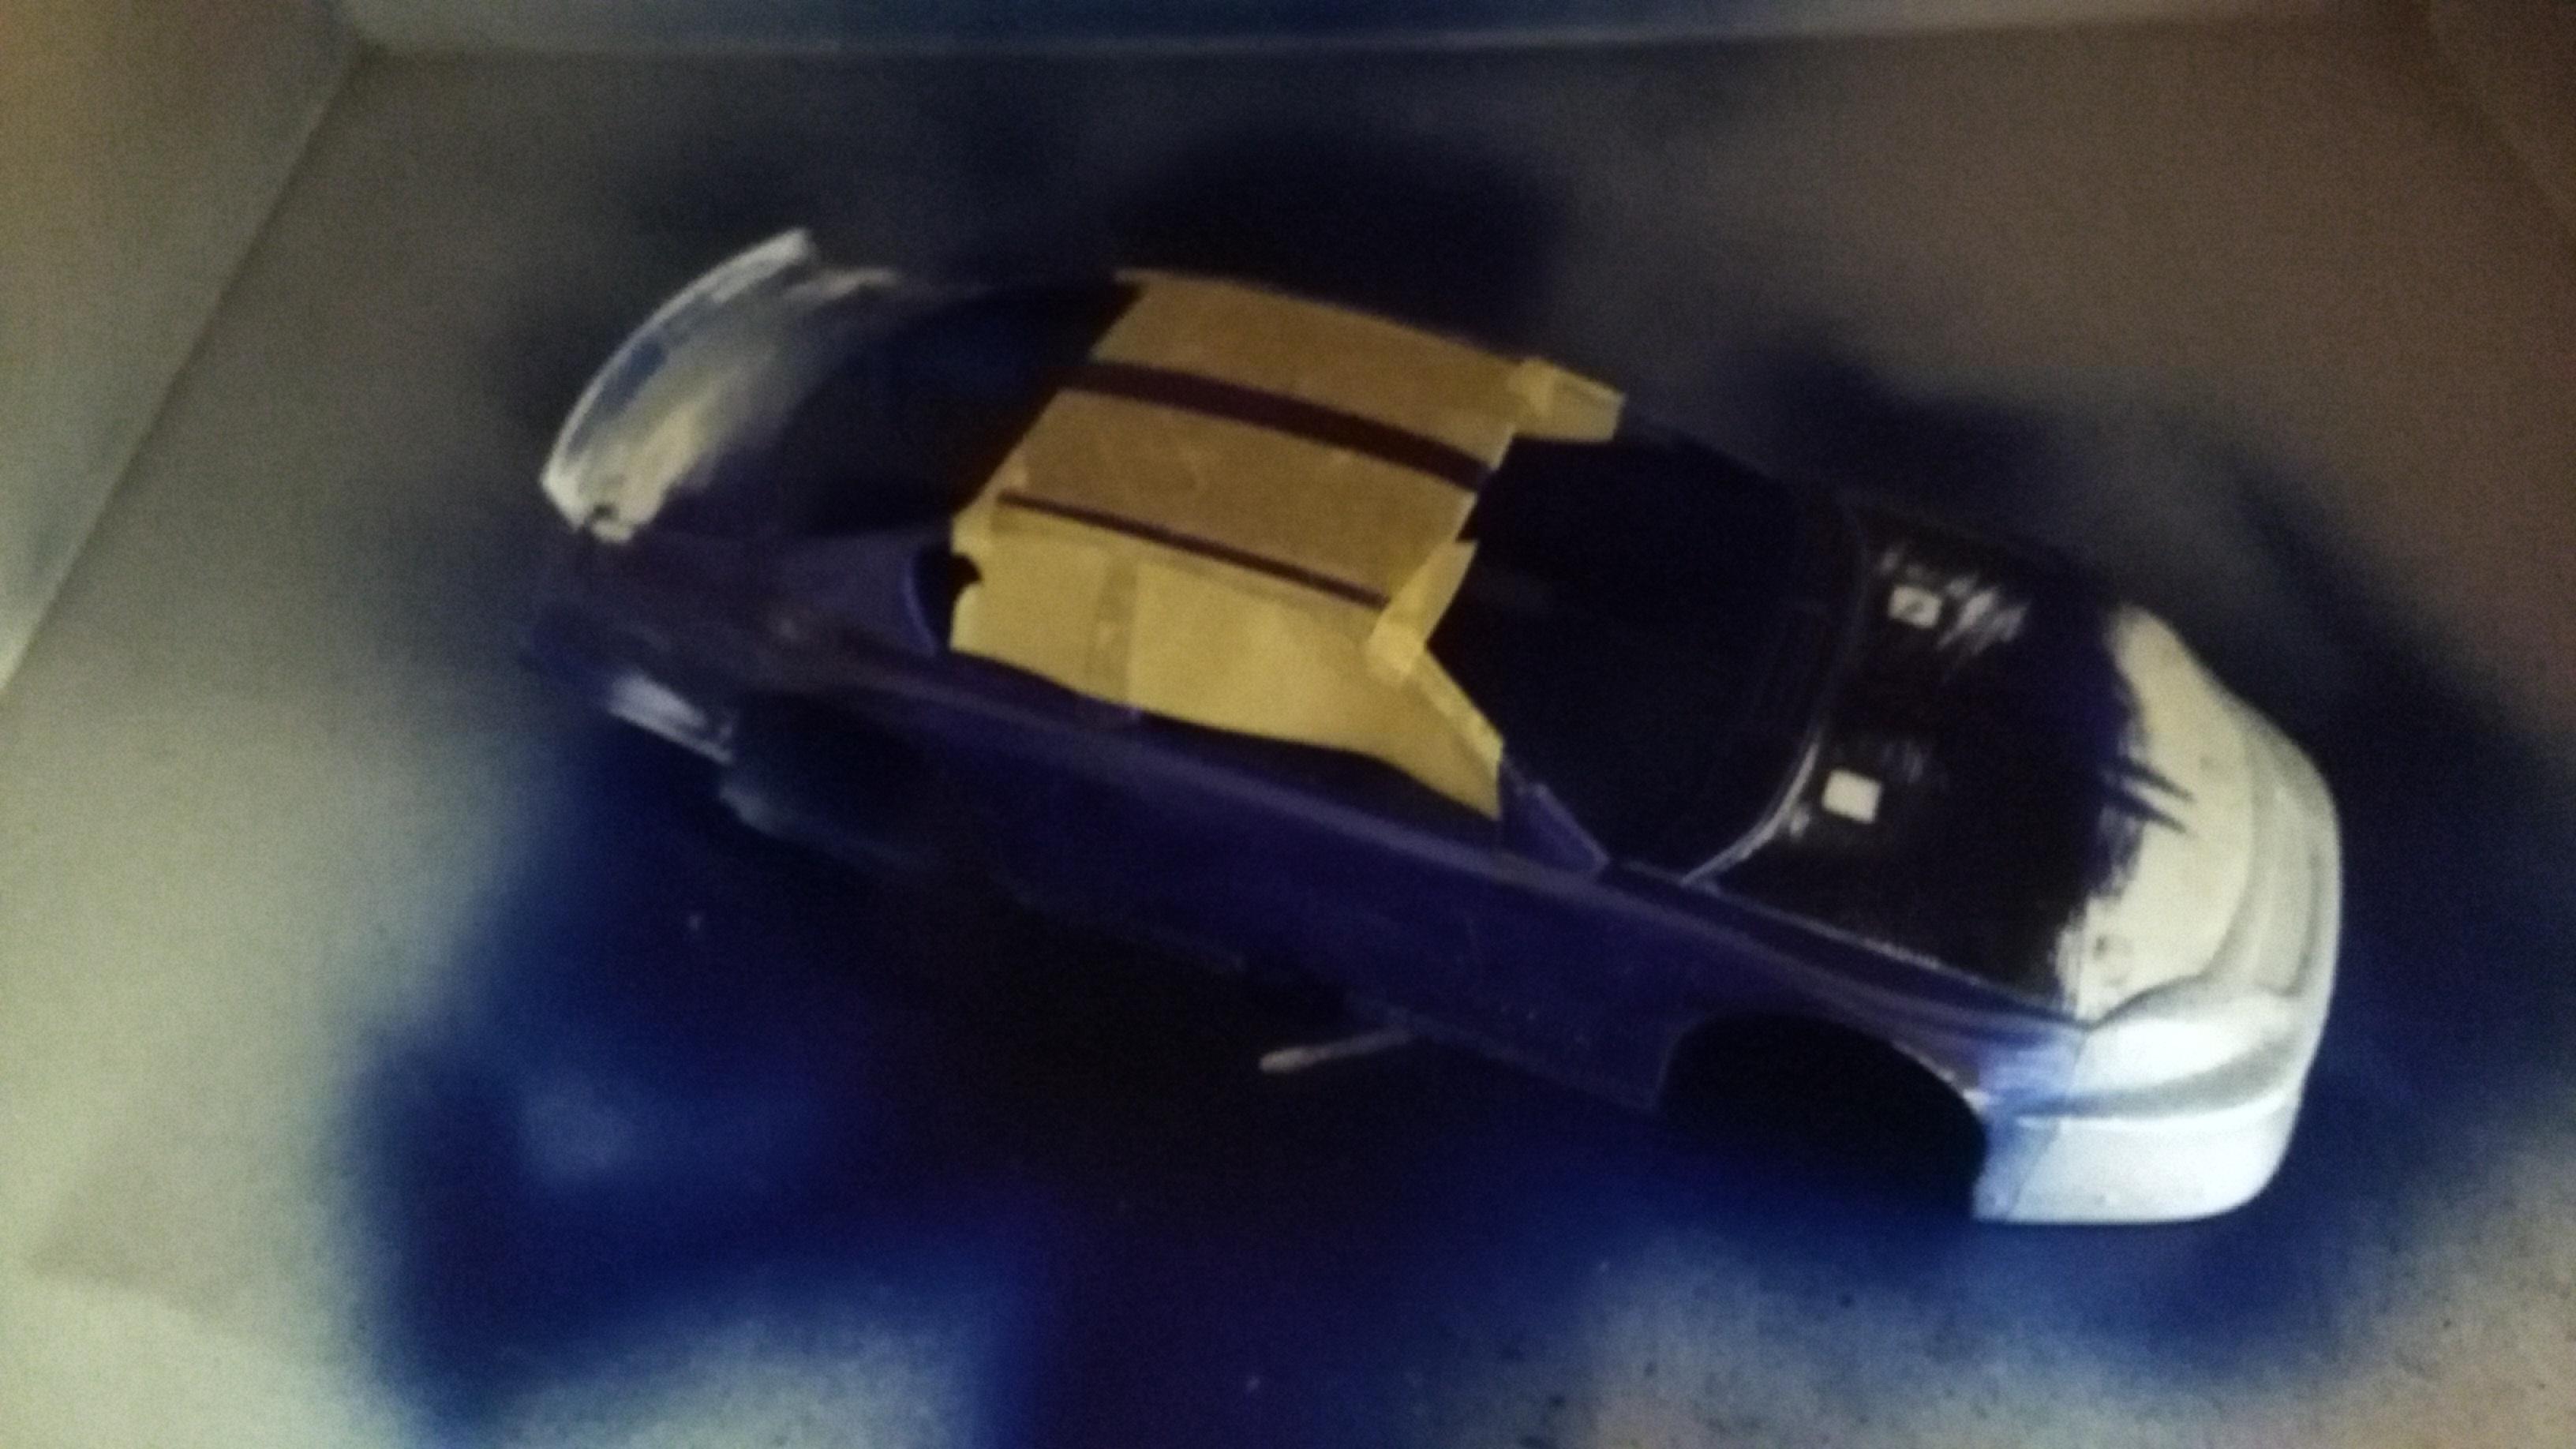 Chevy Monte-Carlo 2005 #24 Jeff Gordon Pepsi/Star Wars  613833IMG20170423111611